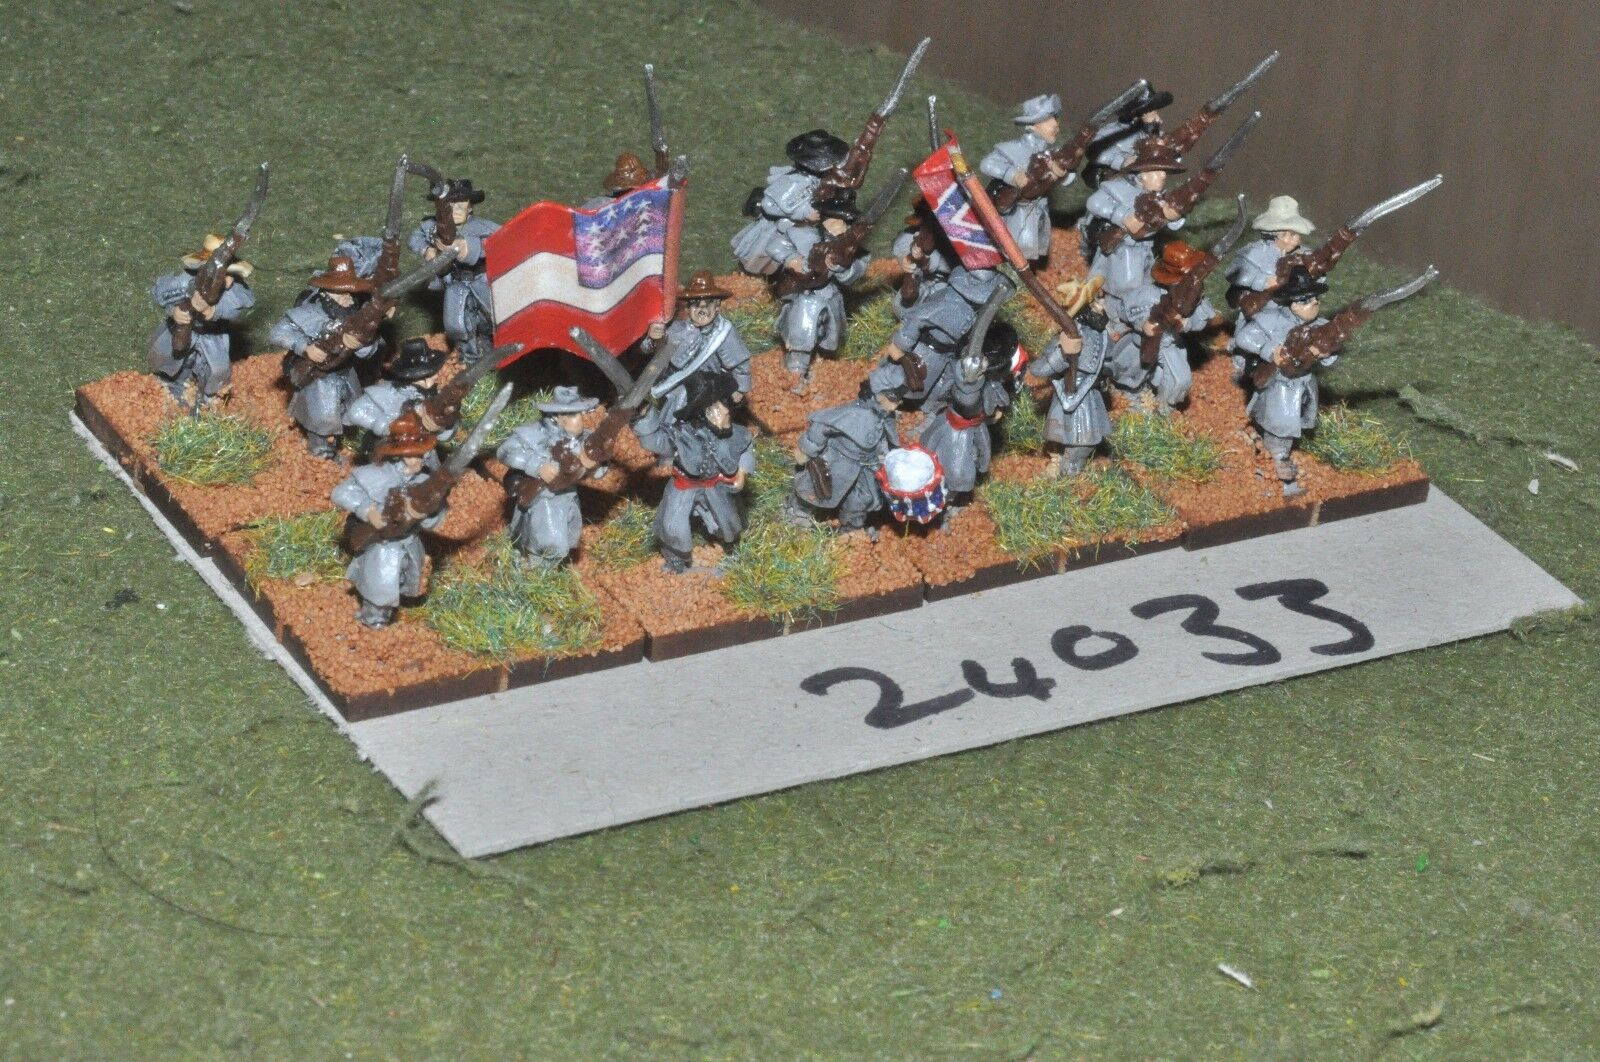 15mm ACW   confederate - regiment 24 figures - inf (24033)